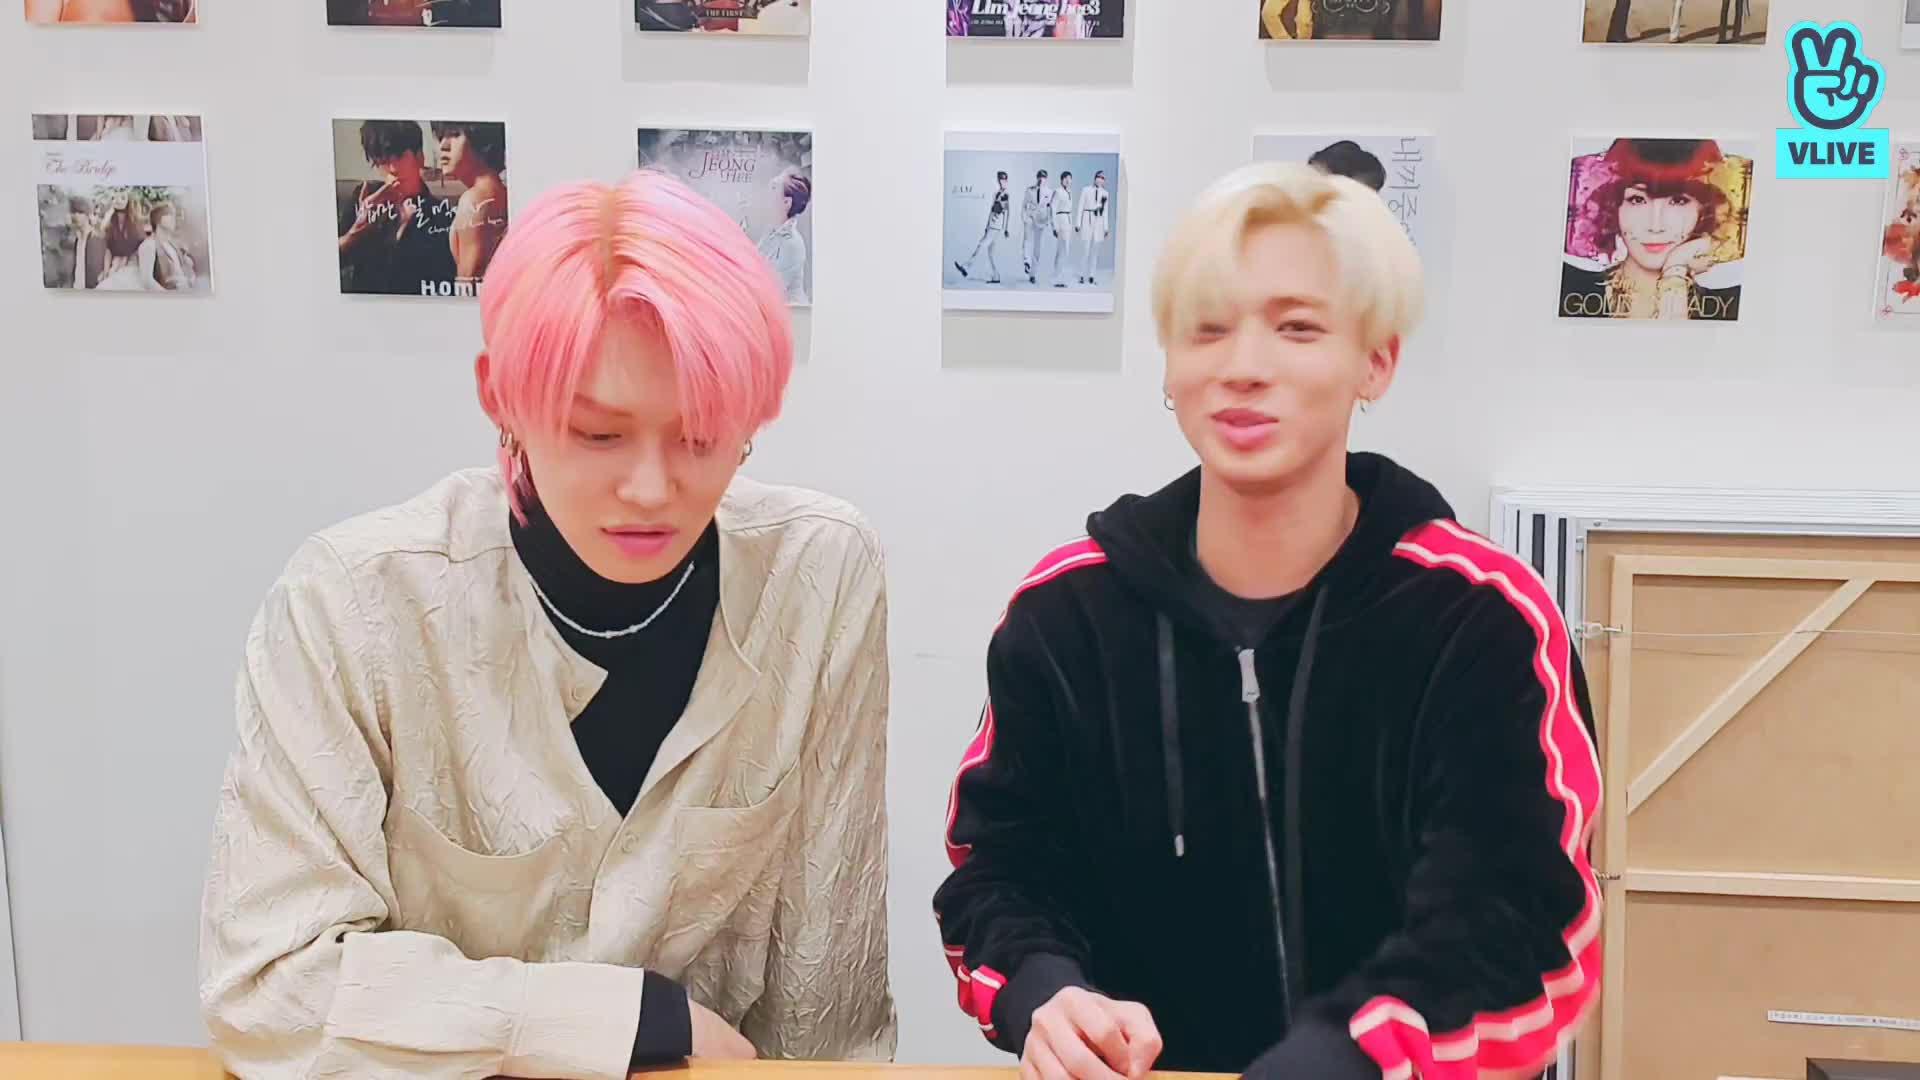 TXT (투모로우바이투게더) '5시 53분의 하늘에서 발견한 너와 나' Official Teaser - 연준(Yeonjun),태현(Taehyun)